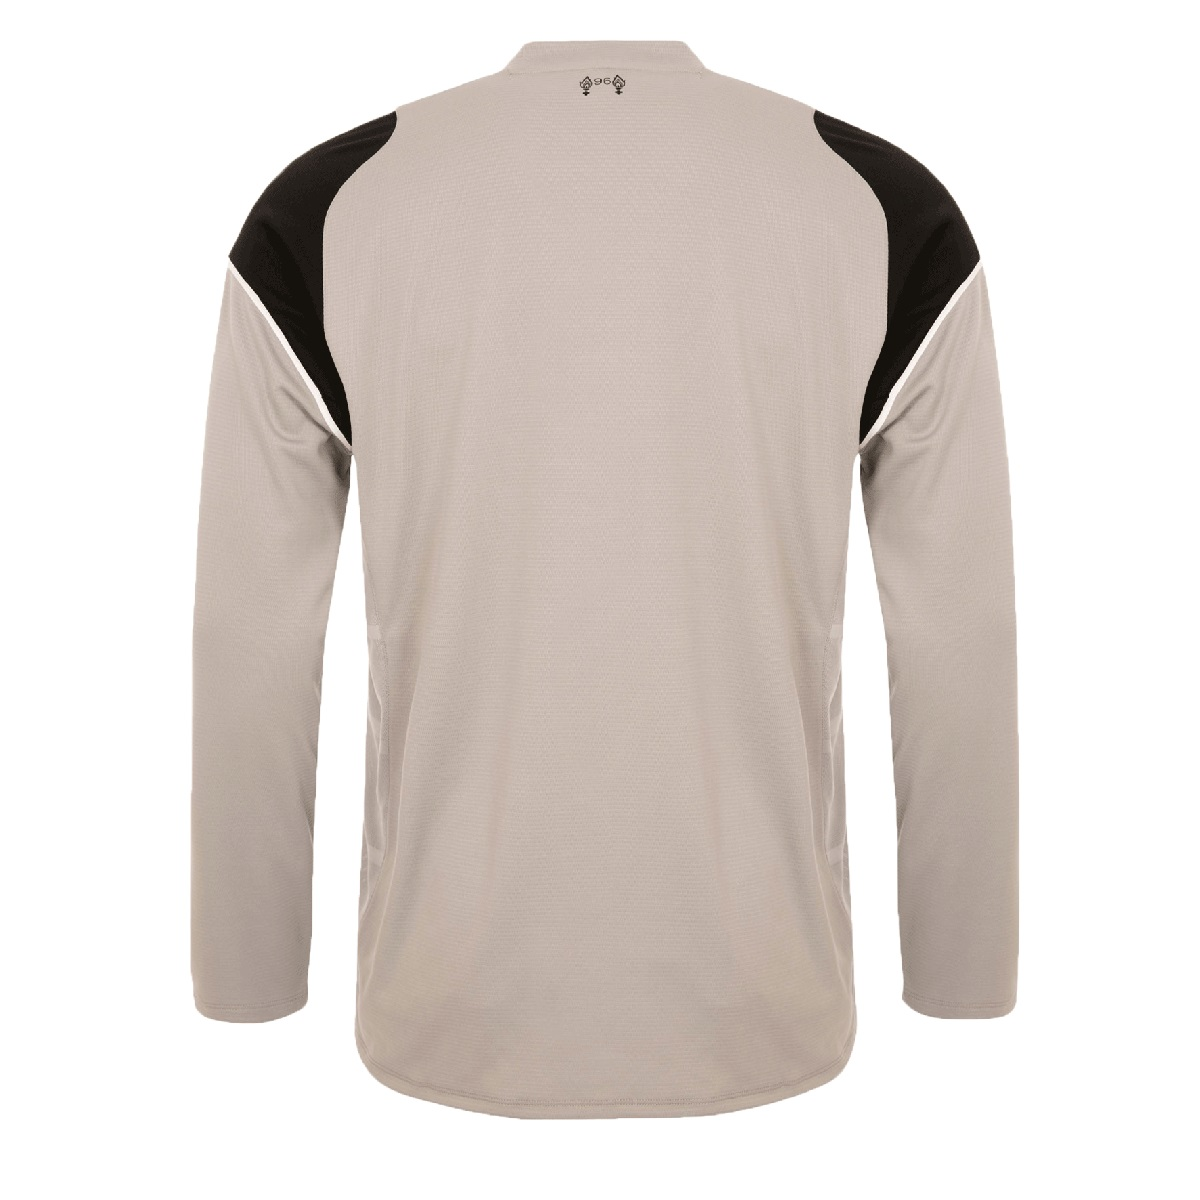 Liverpool Third Kit 2016-17 Goalkeeper Shirt Back